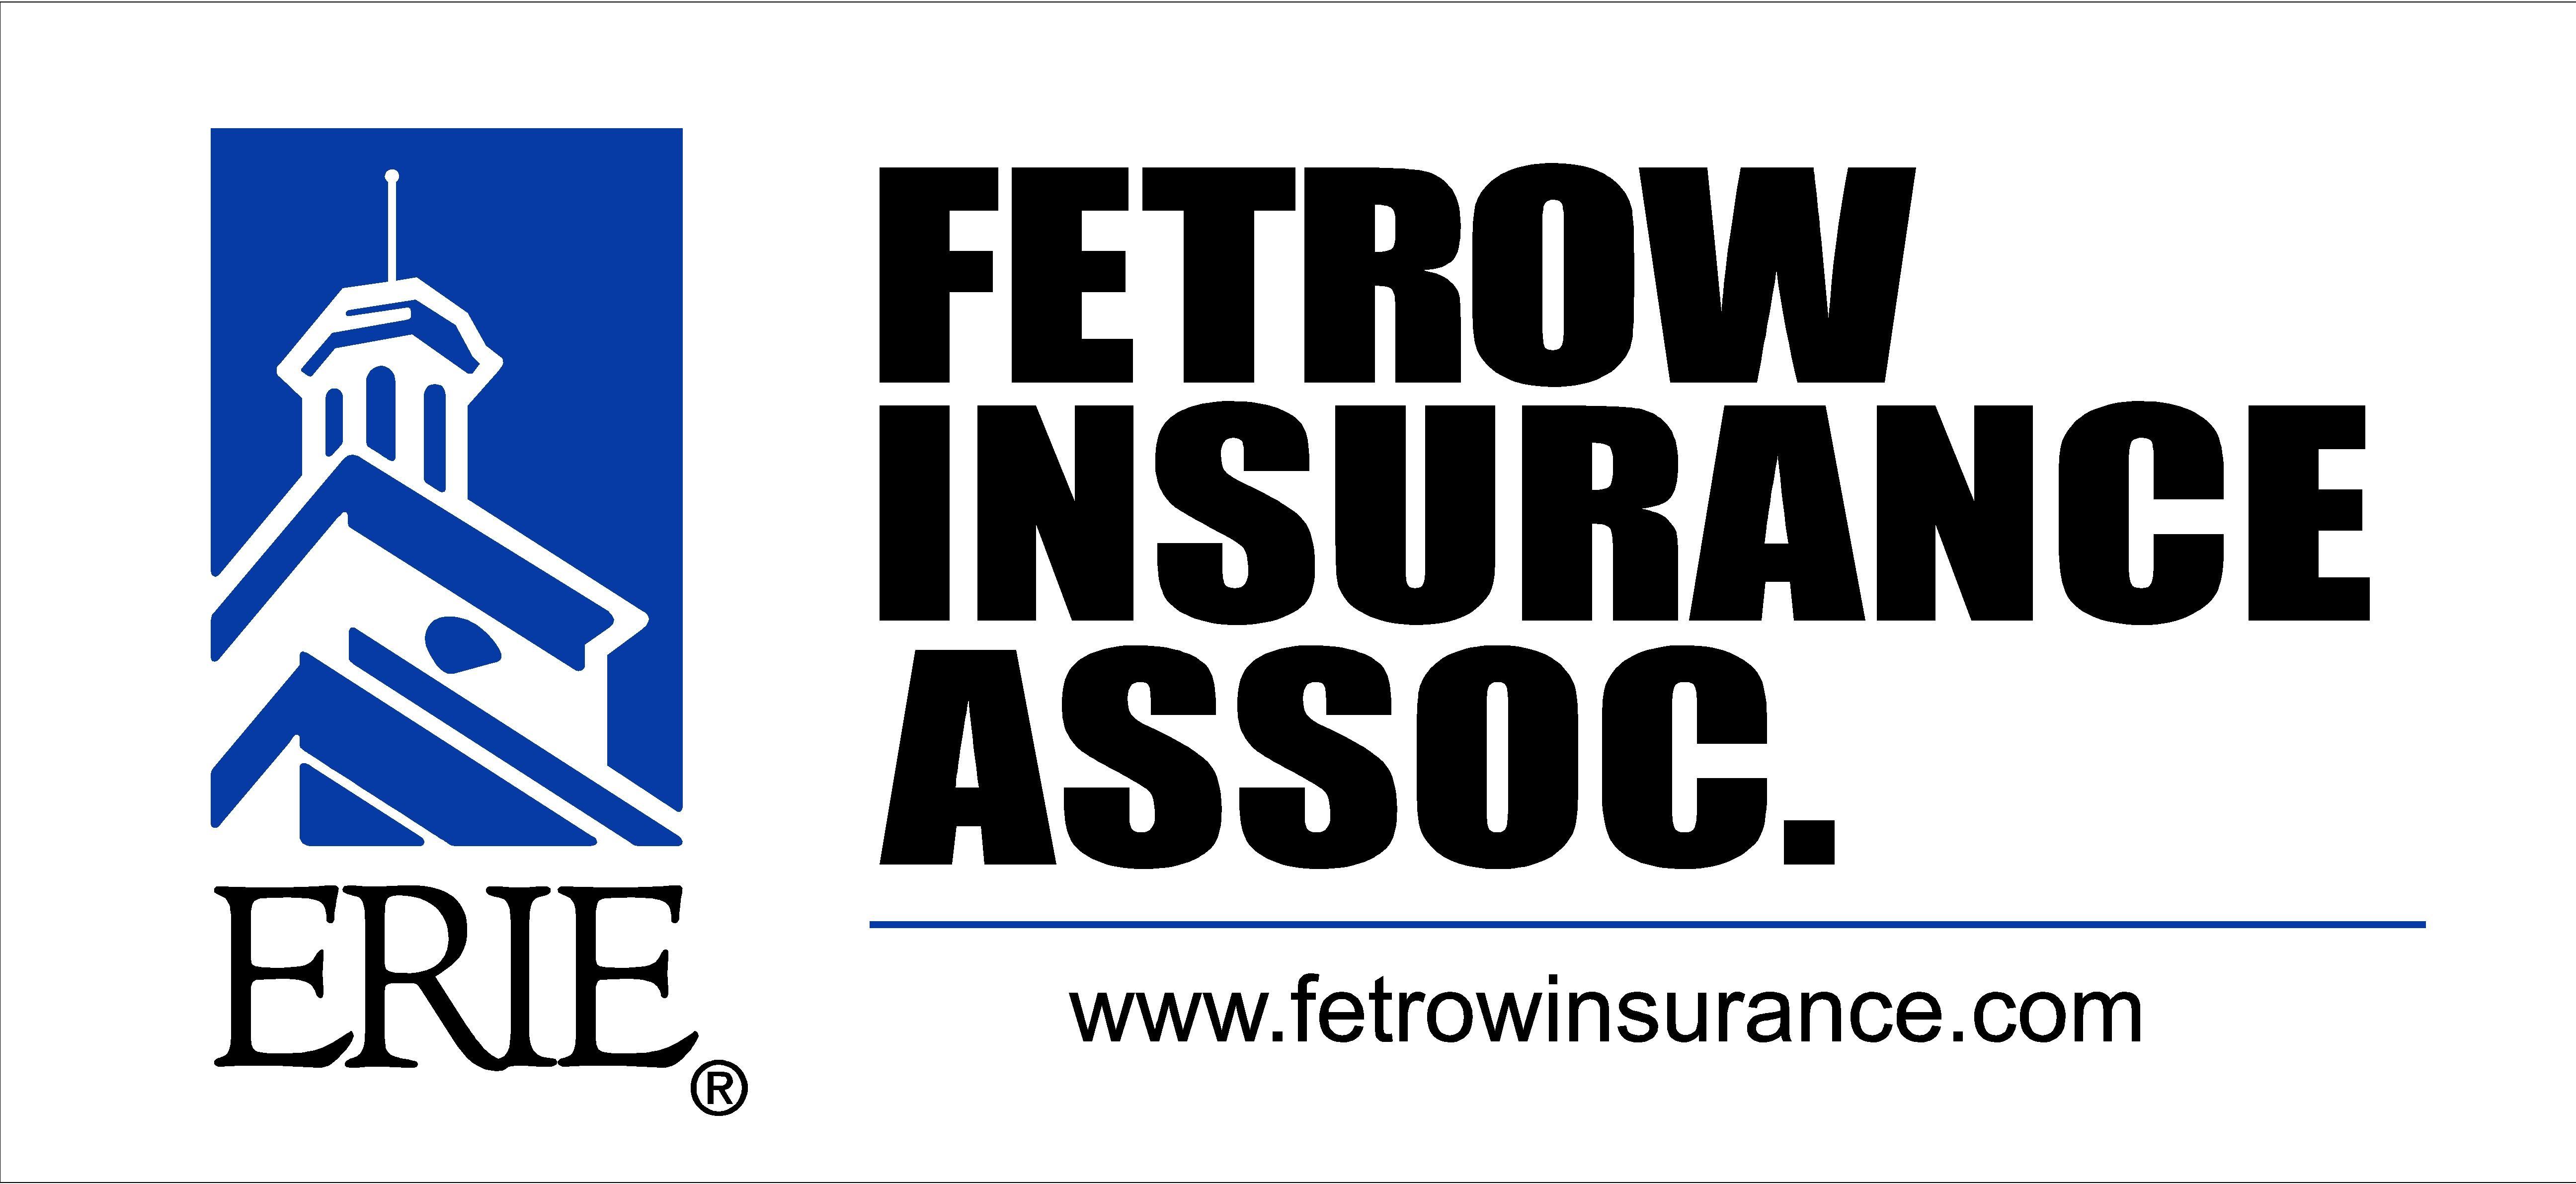 fetrow_insurance